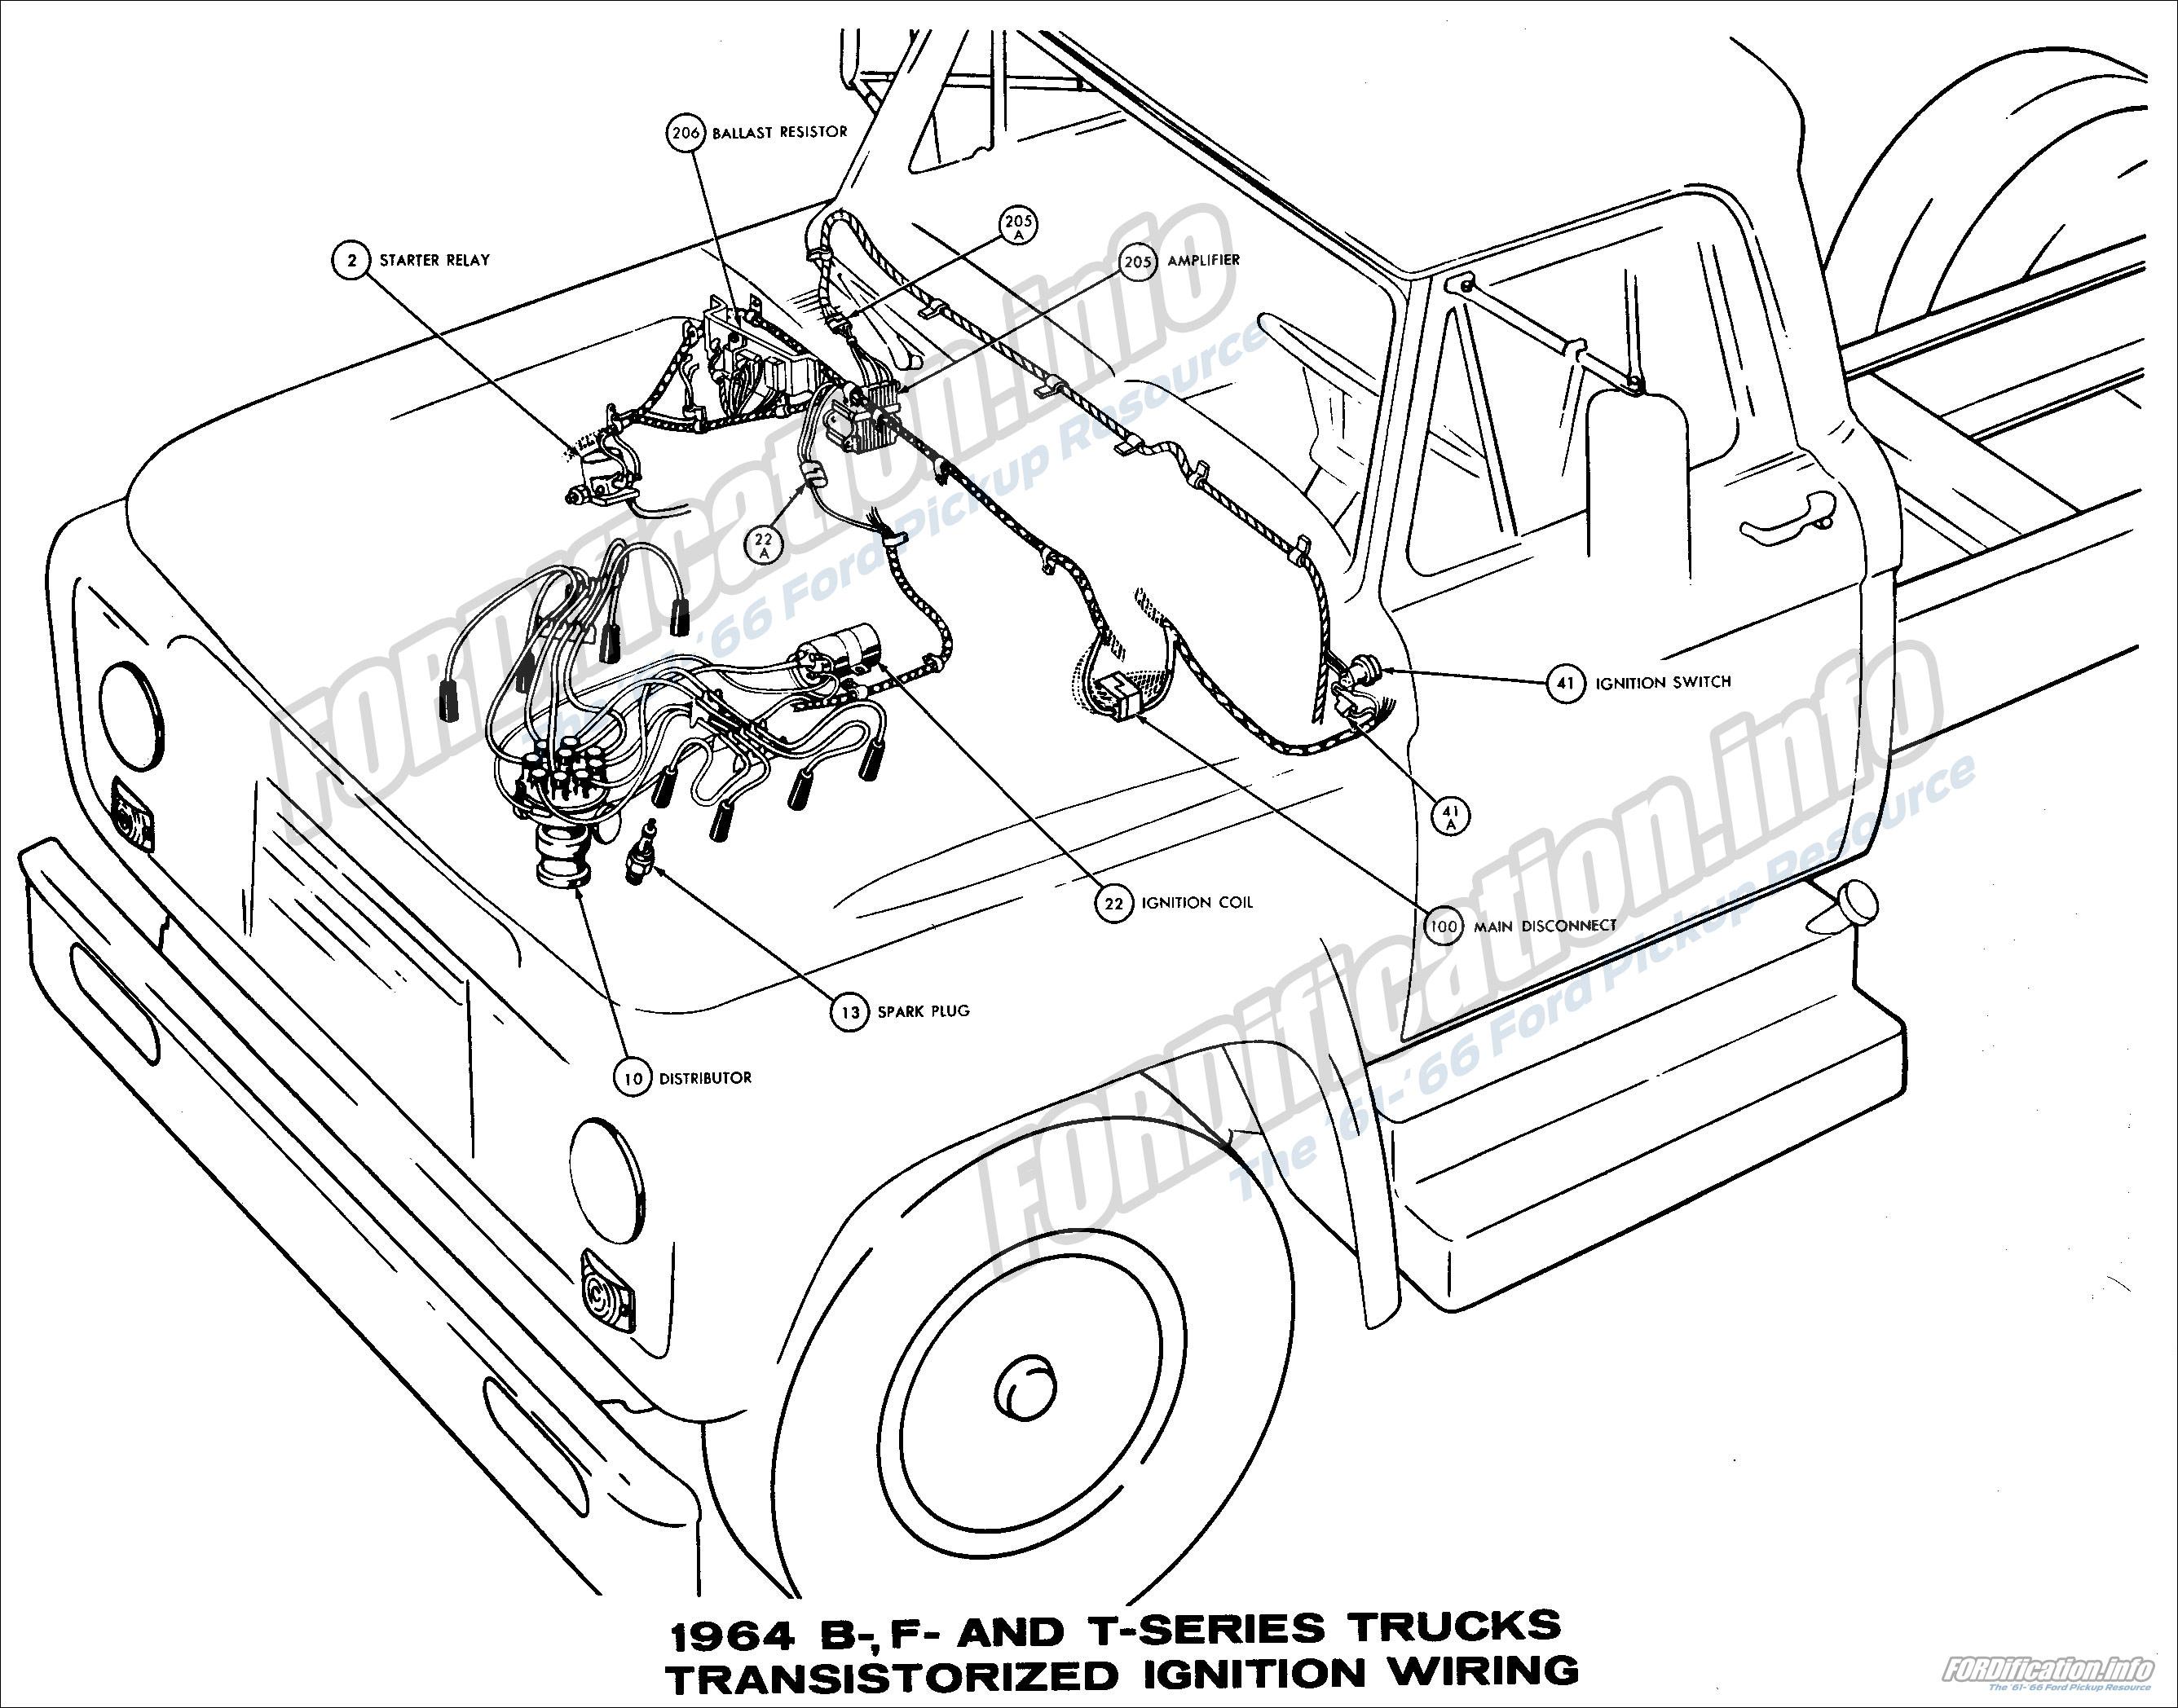 Transistorized ignition wiring